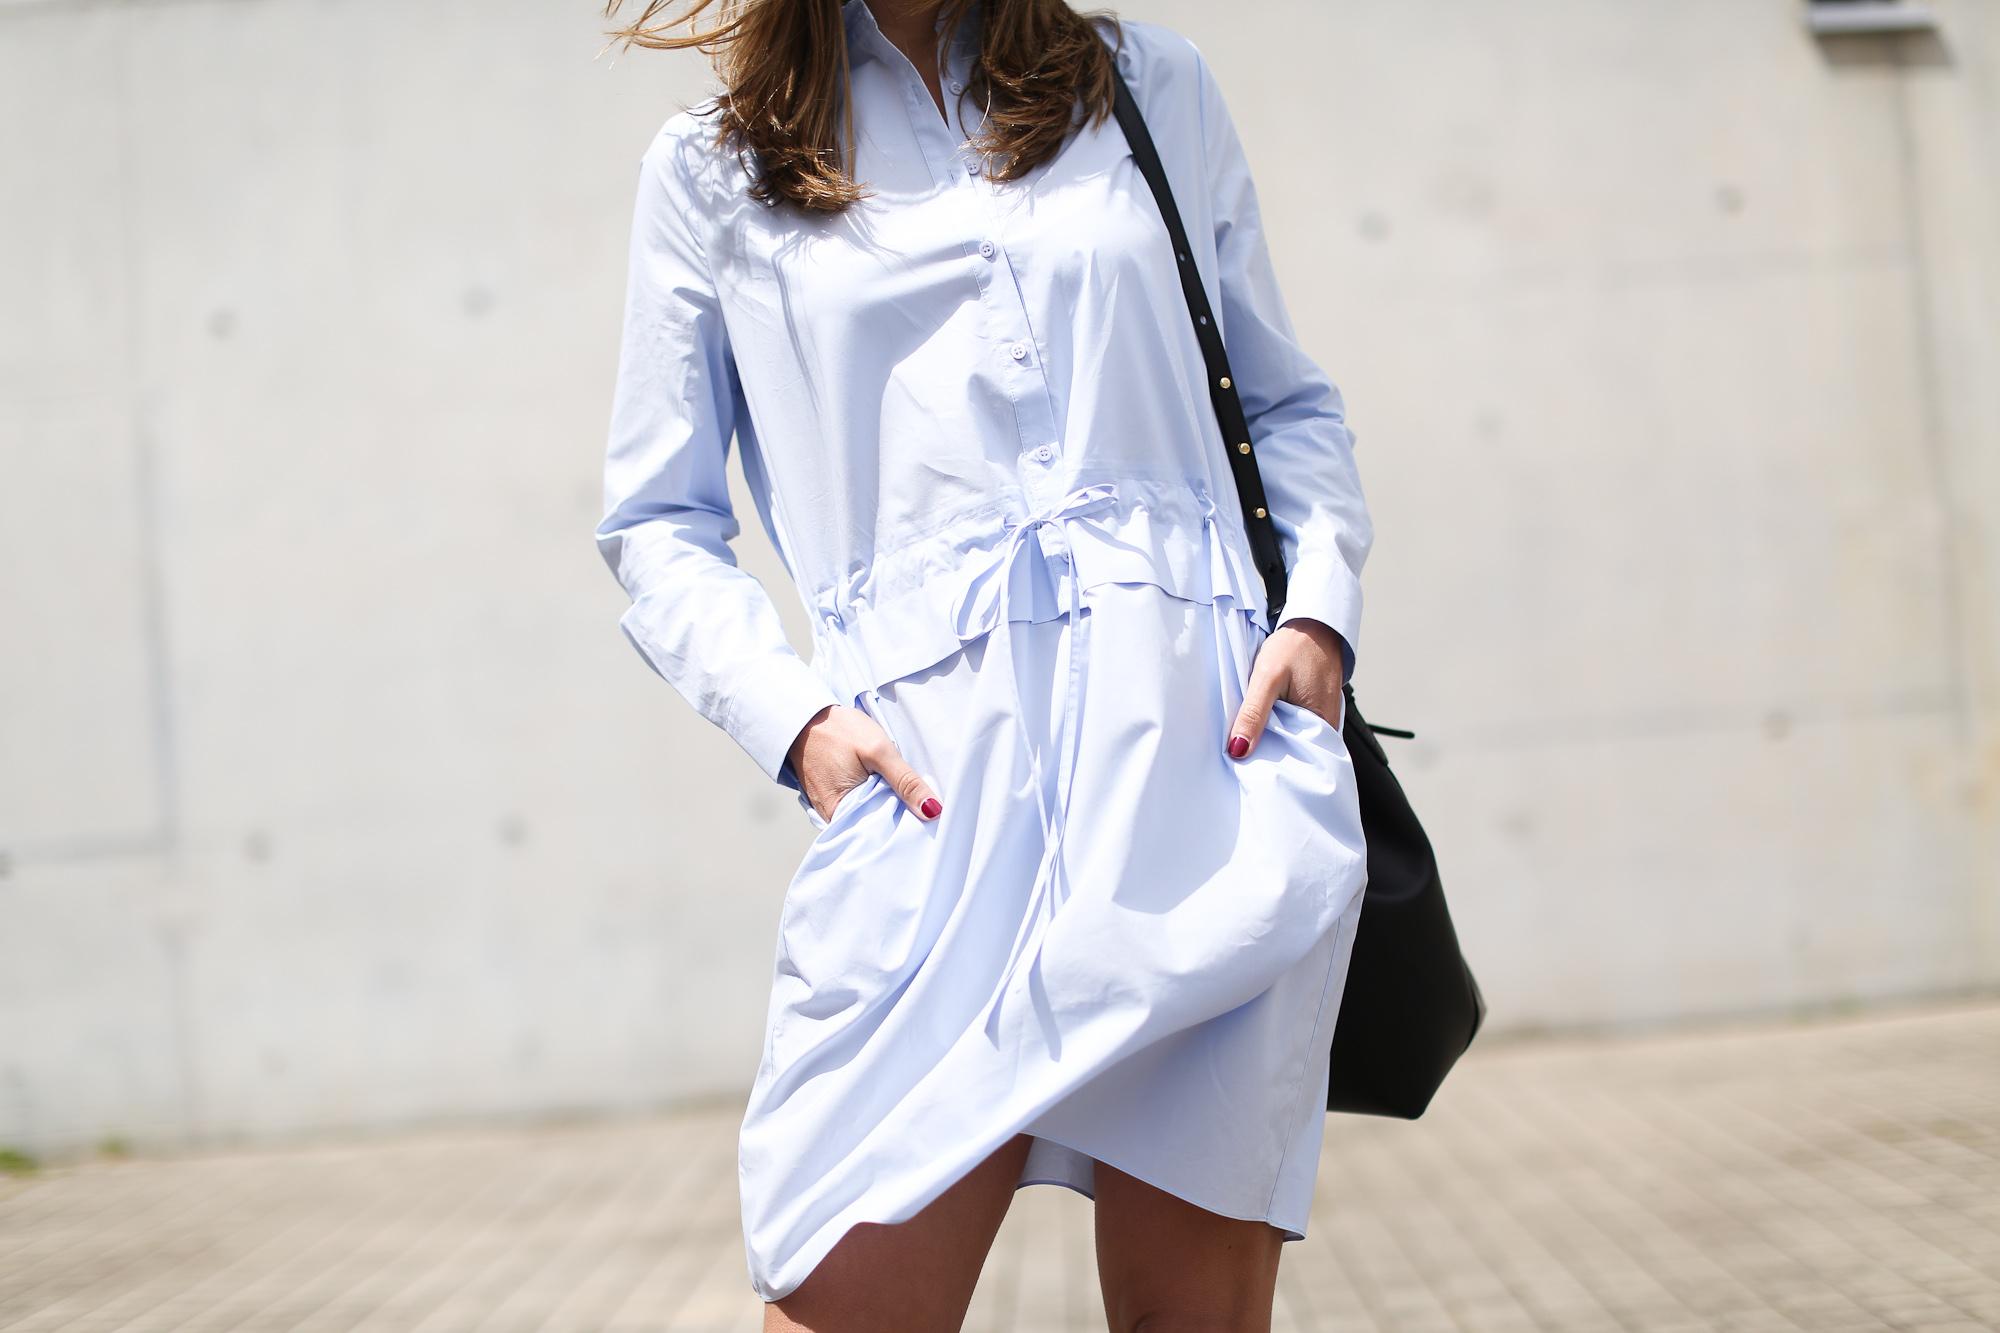 Clochet_streetstyle_theoutnet_irisandink_shirtdress_mansurgavrielbucketbag-6